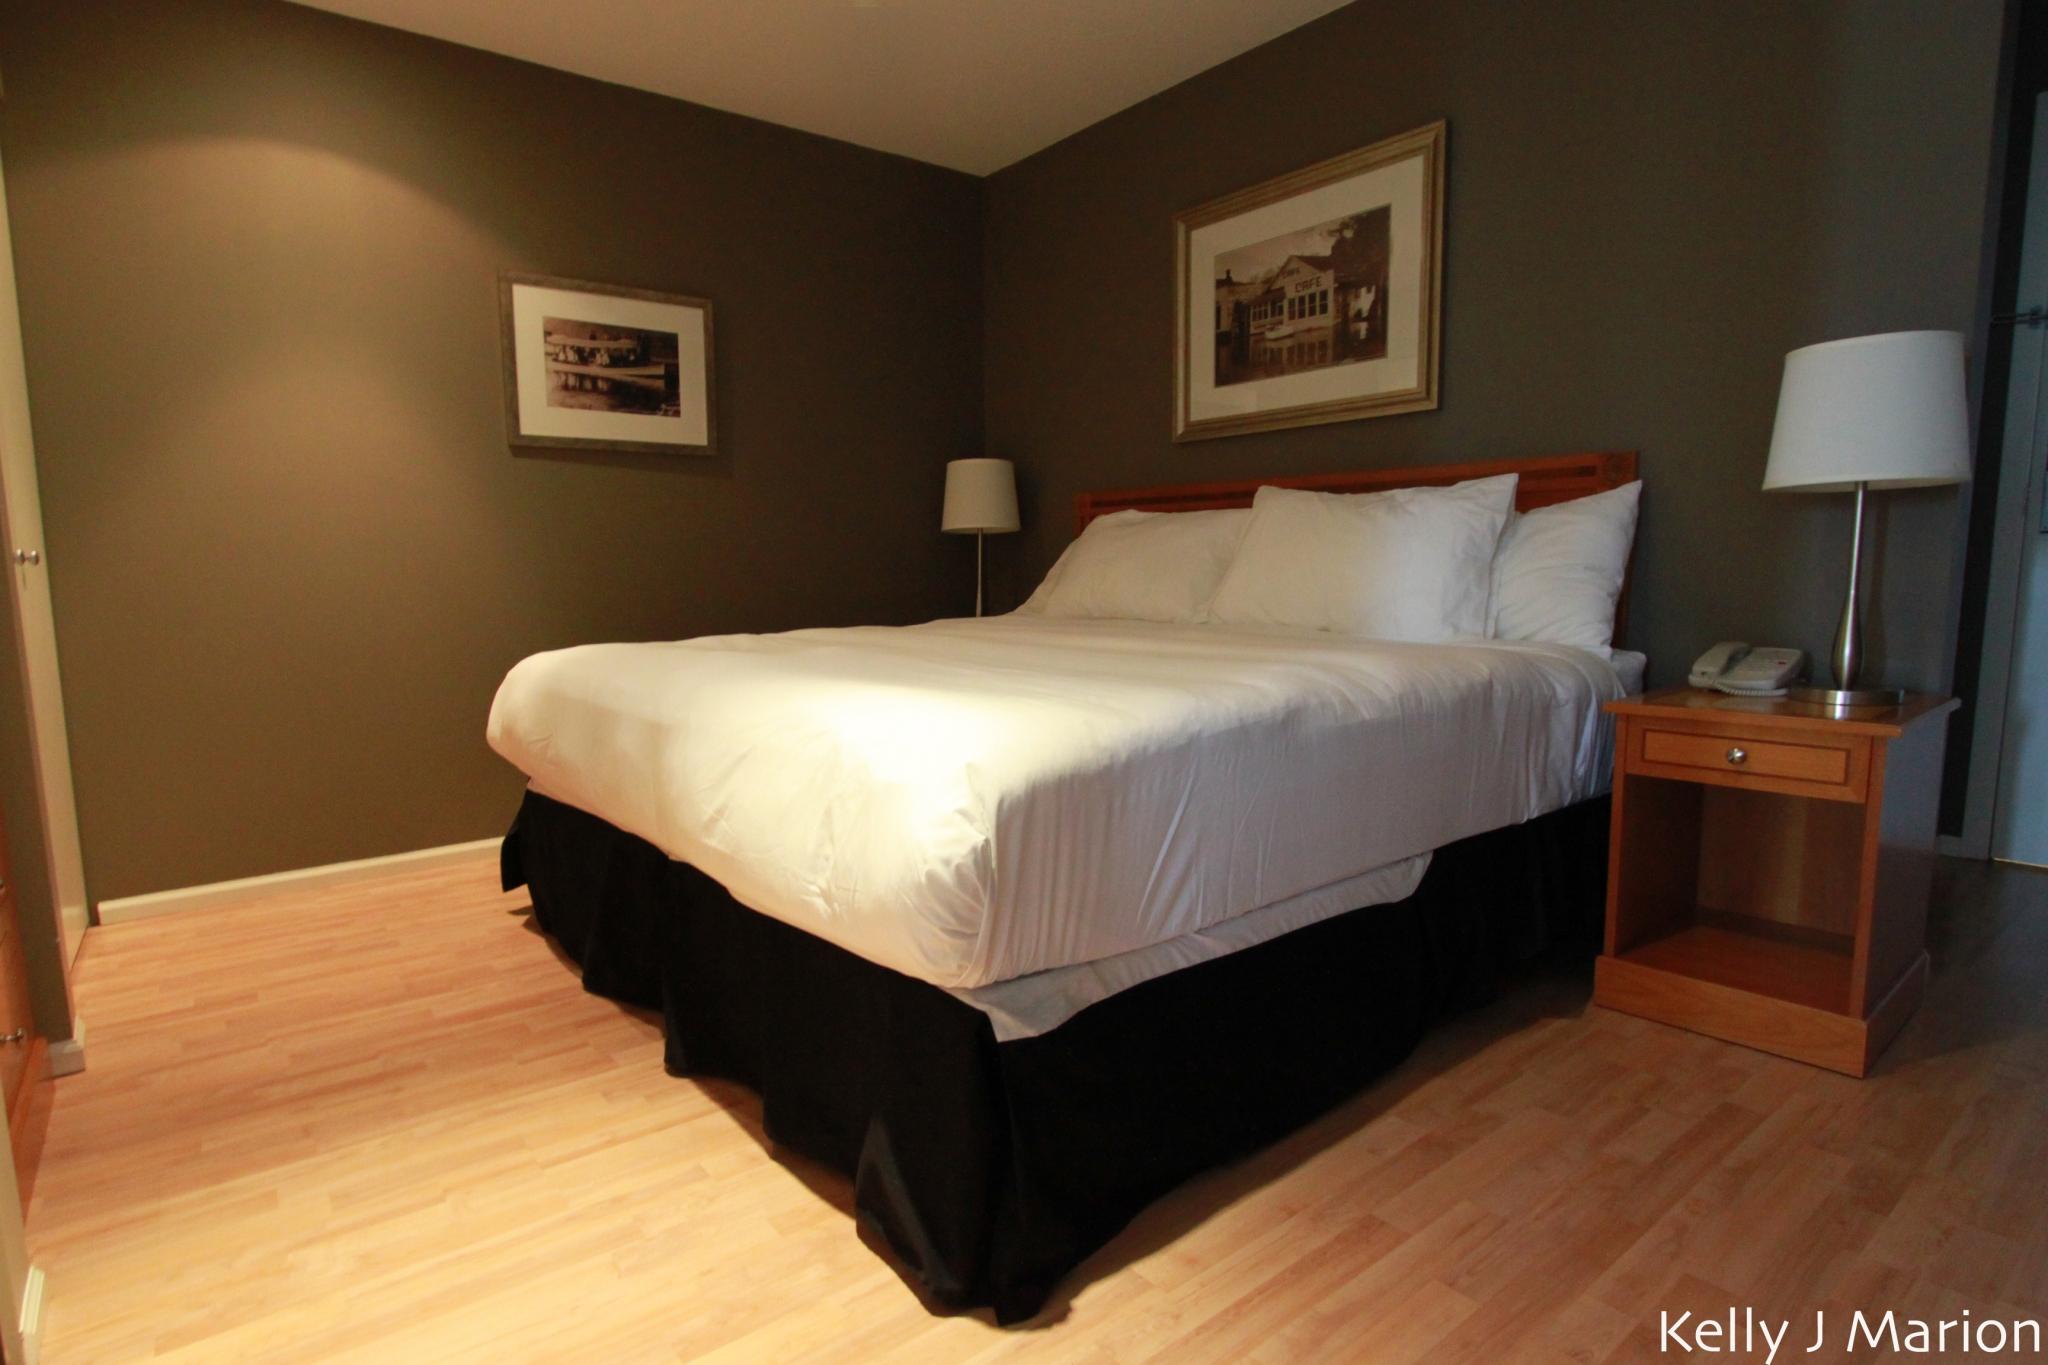 Bed Frames Vancouver Vancouver Solid Oak Bed Frame Vancouver Pine Bed Vancouver Pine Bed